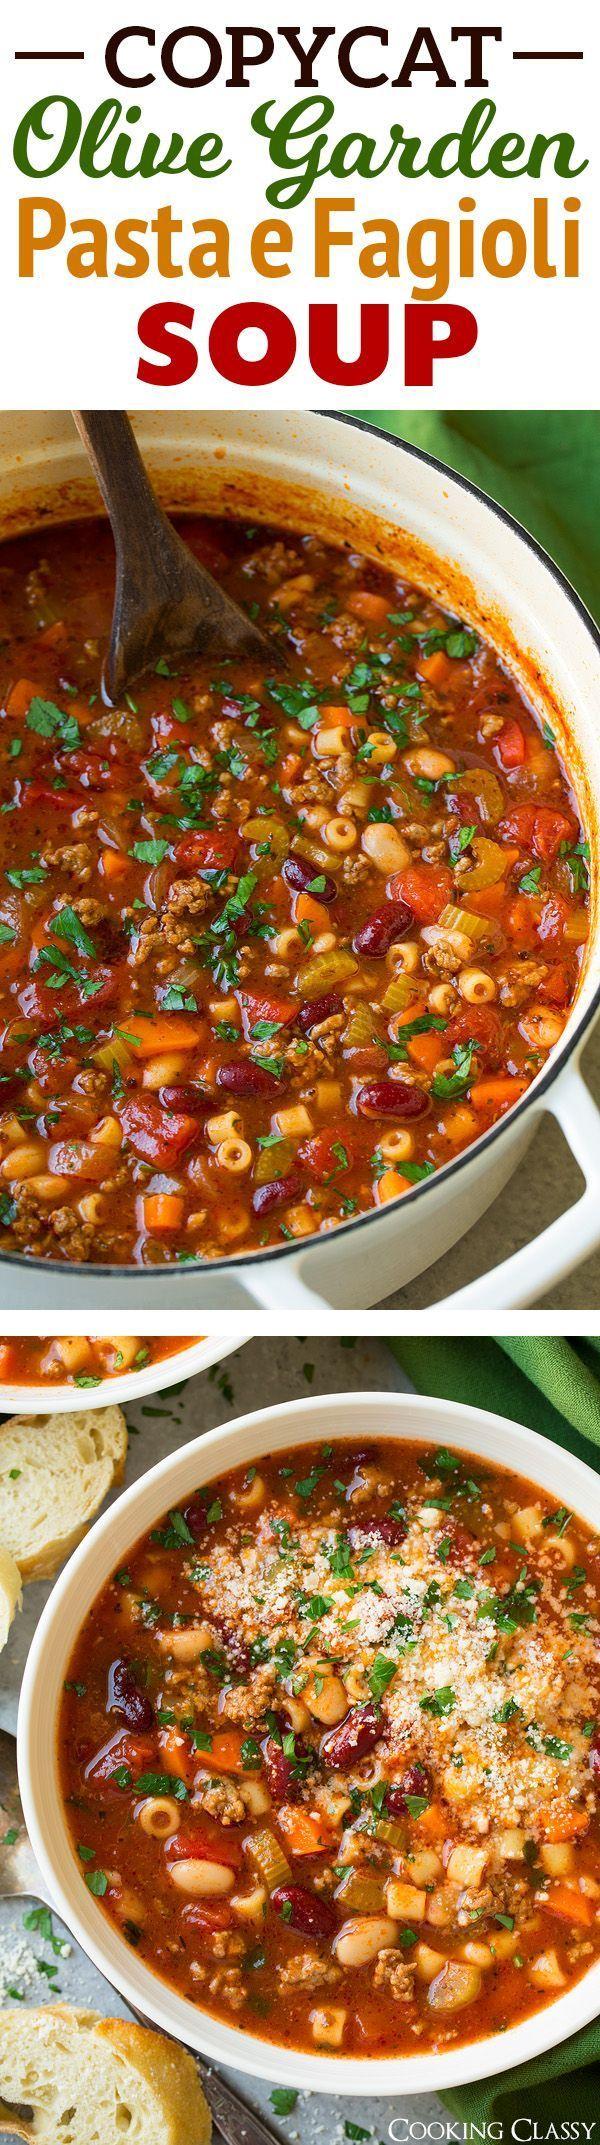 Olive Garden Pasta e Fagioli Soup Copycat Recipe - a family favorite! One of my ... -